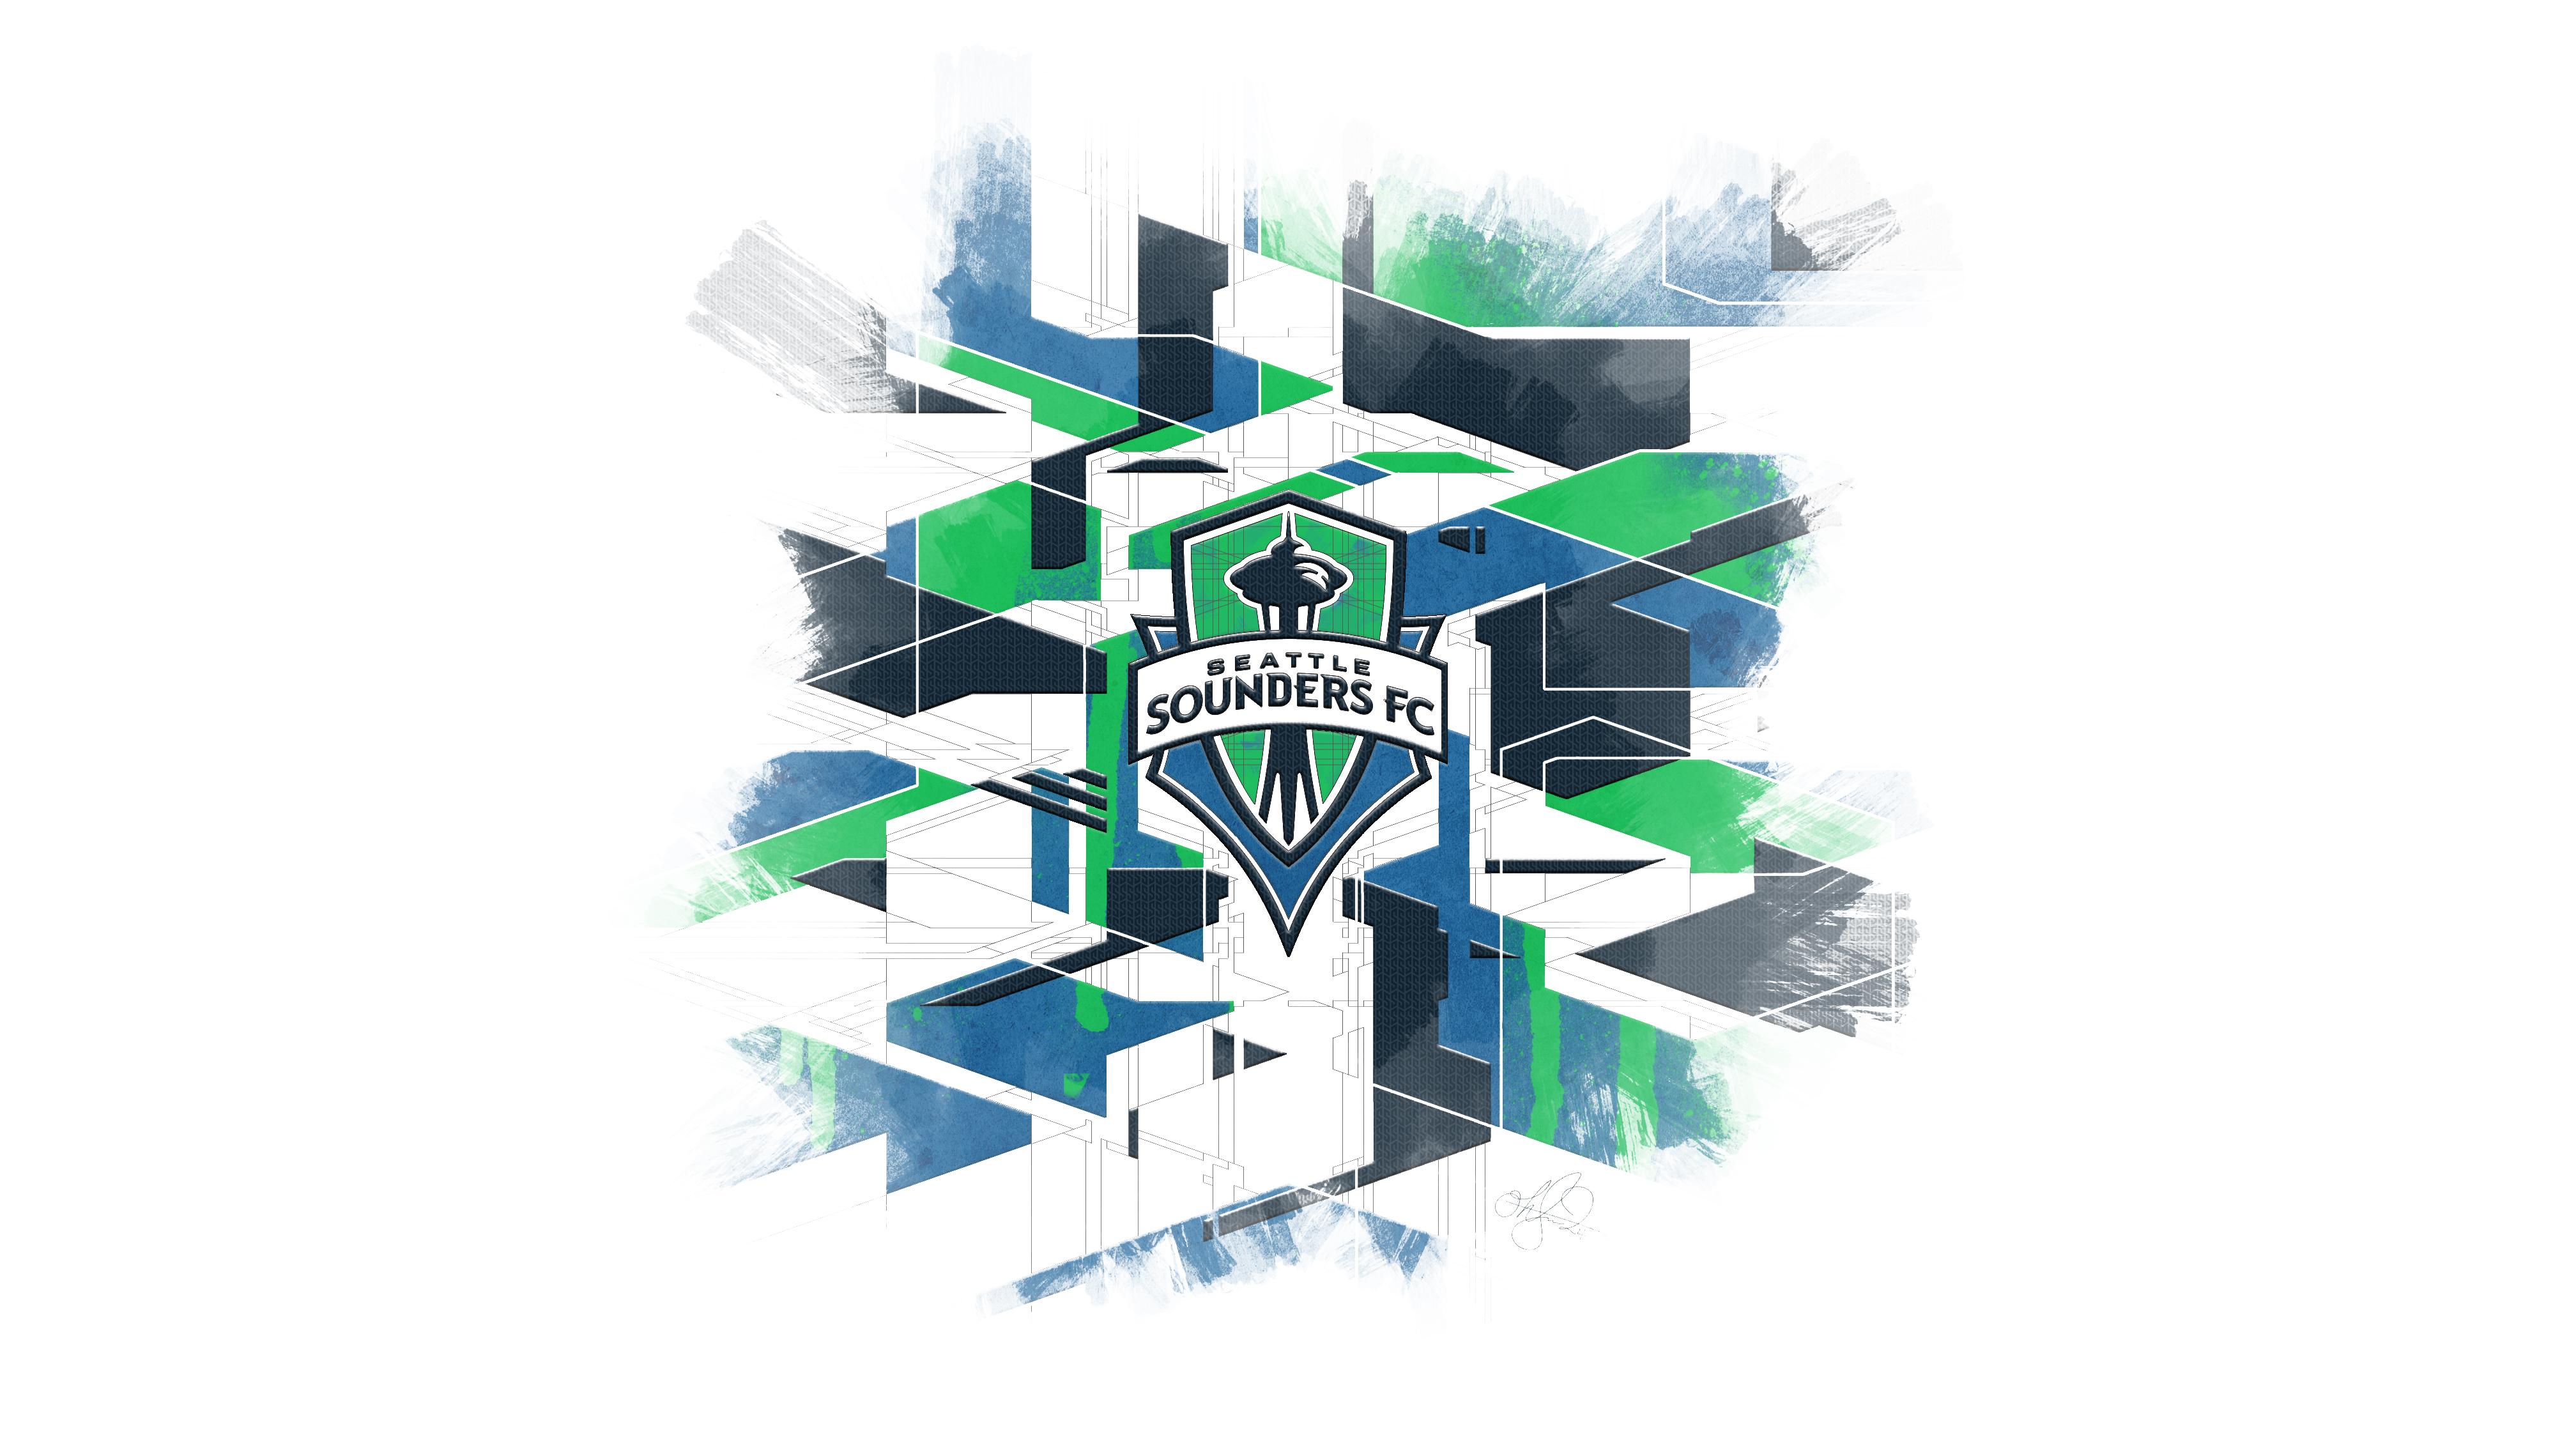 ... design now available as desktop wallpaper | Seattle Sounders FC